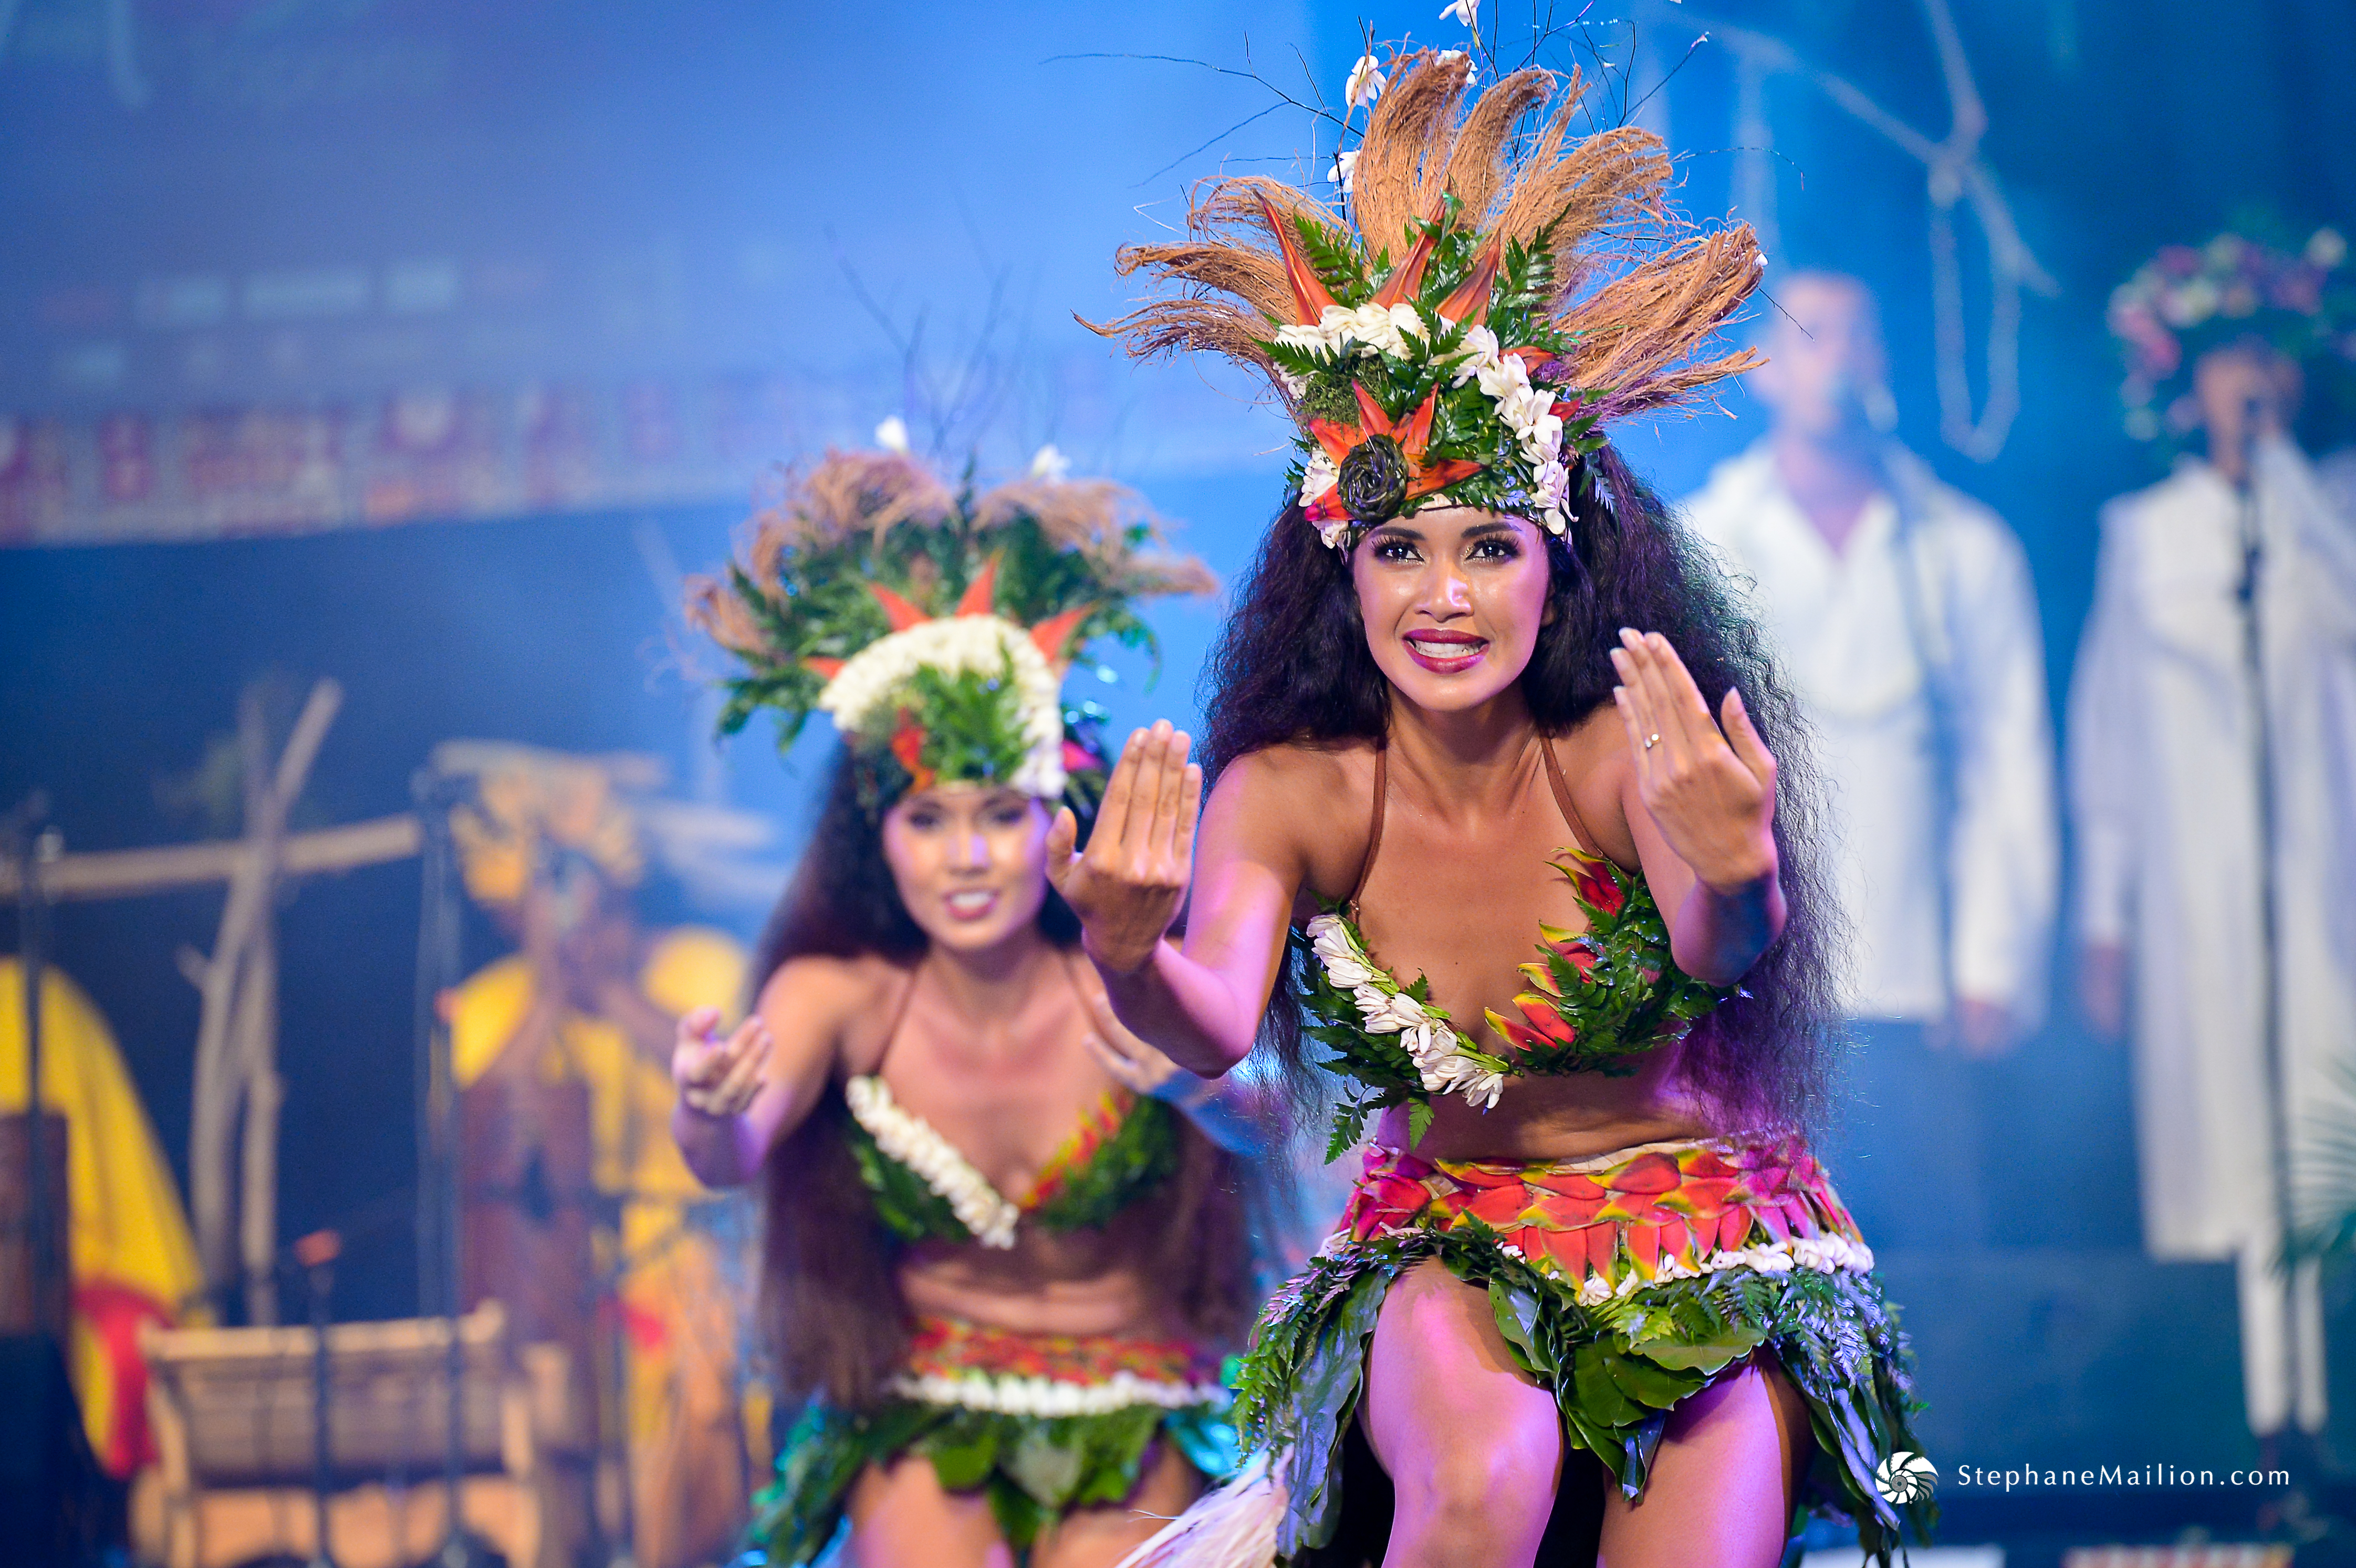 Le Hura Tapairu est devenu un événement culturel incontournable. Ici le groupe Manohiva.